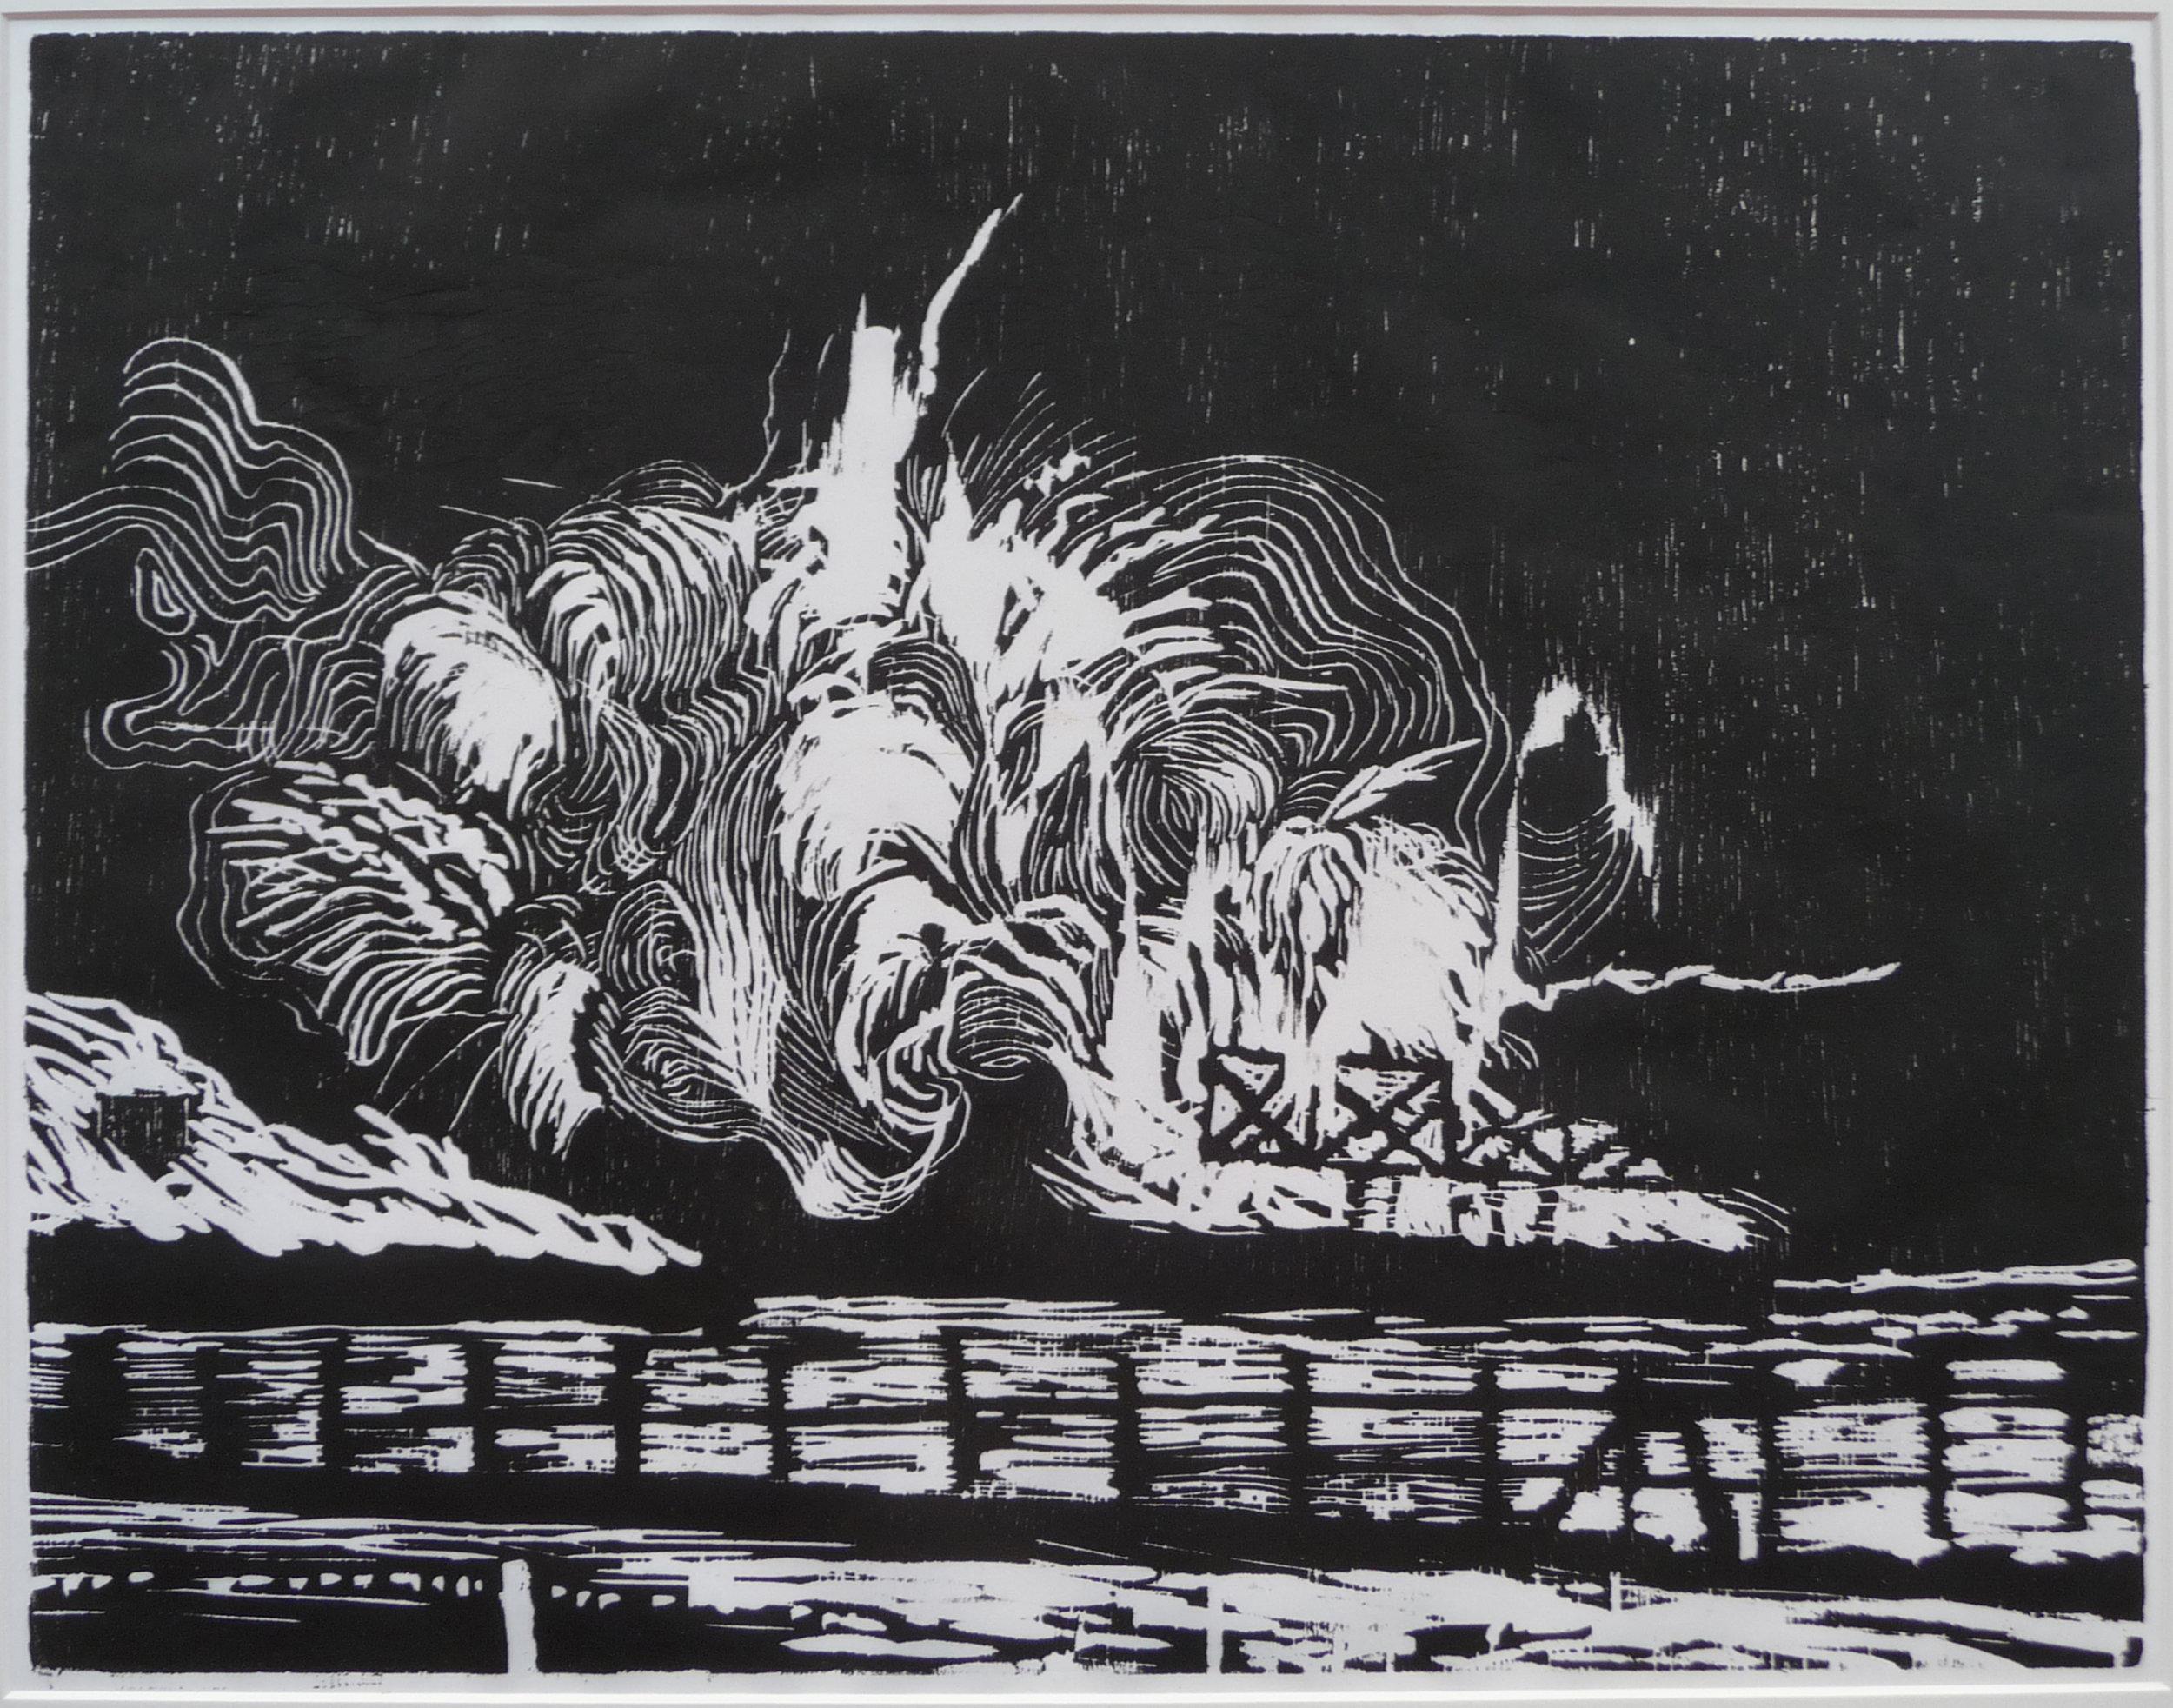 Z.t. woodcut, 25 x 34 cm, 2012